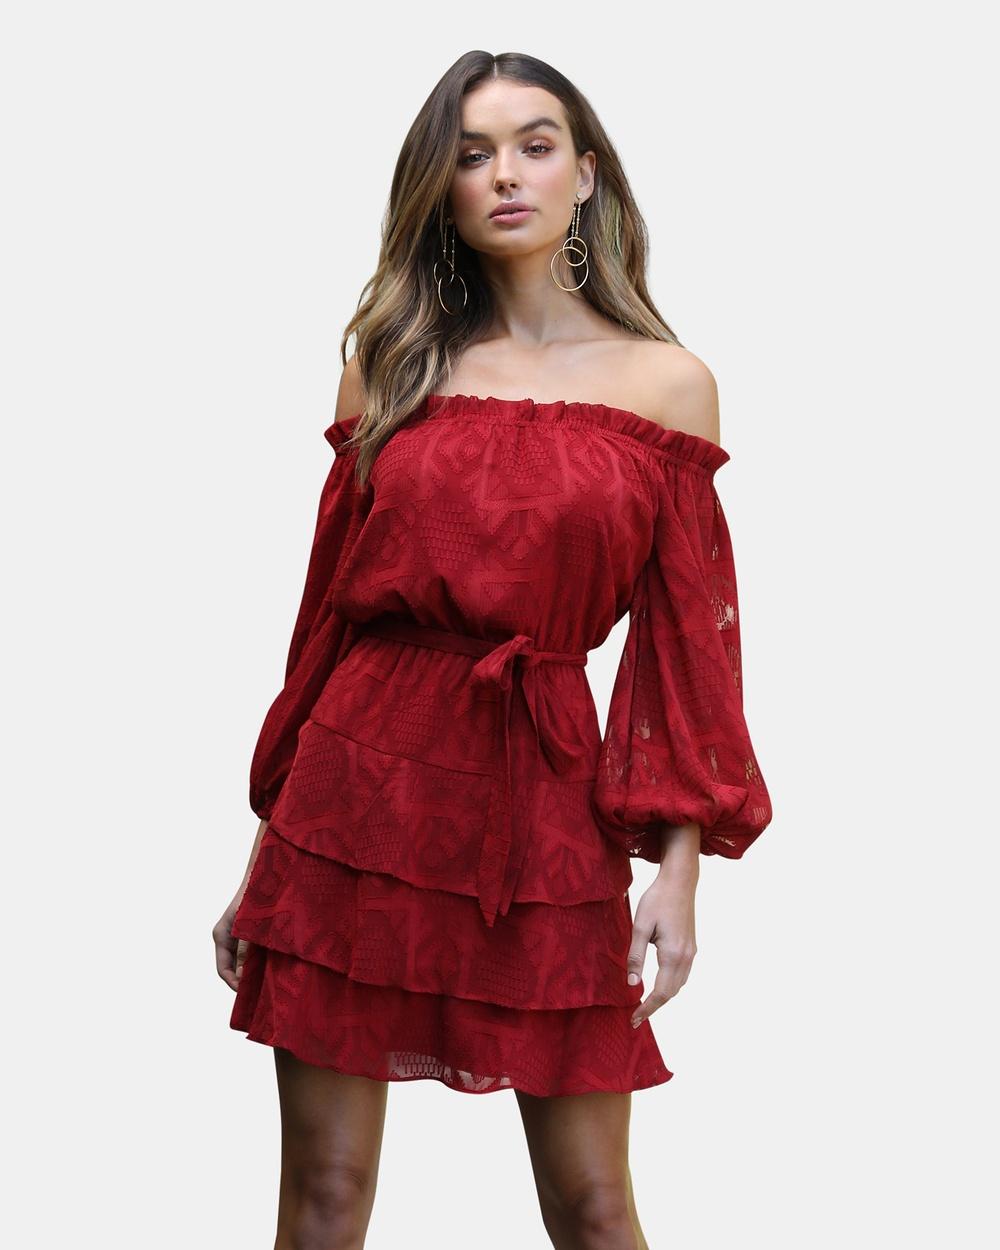 Rodeo Show Harrison Dress Dresses Burnt Red Harrison Dress